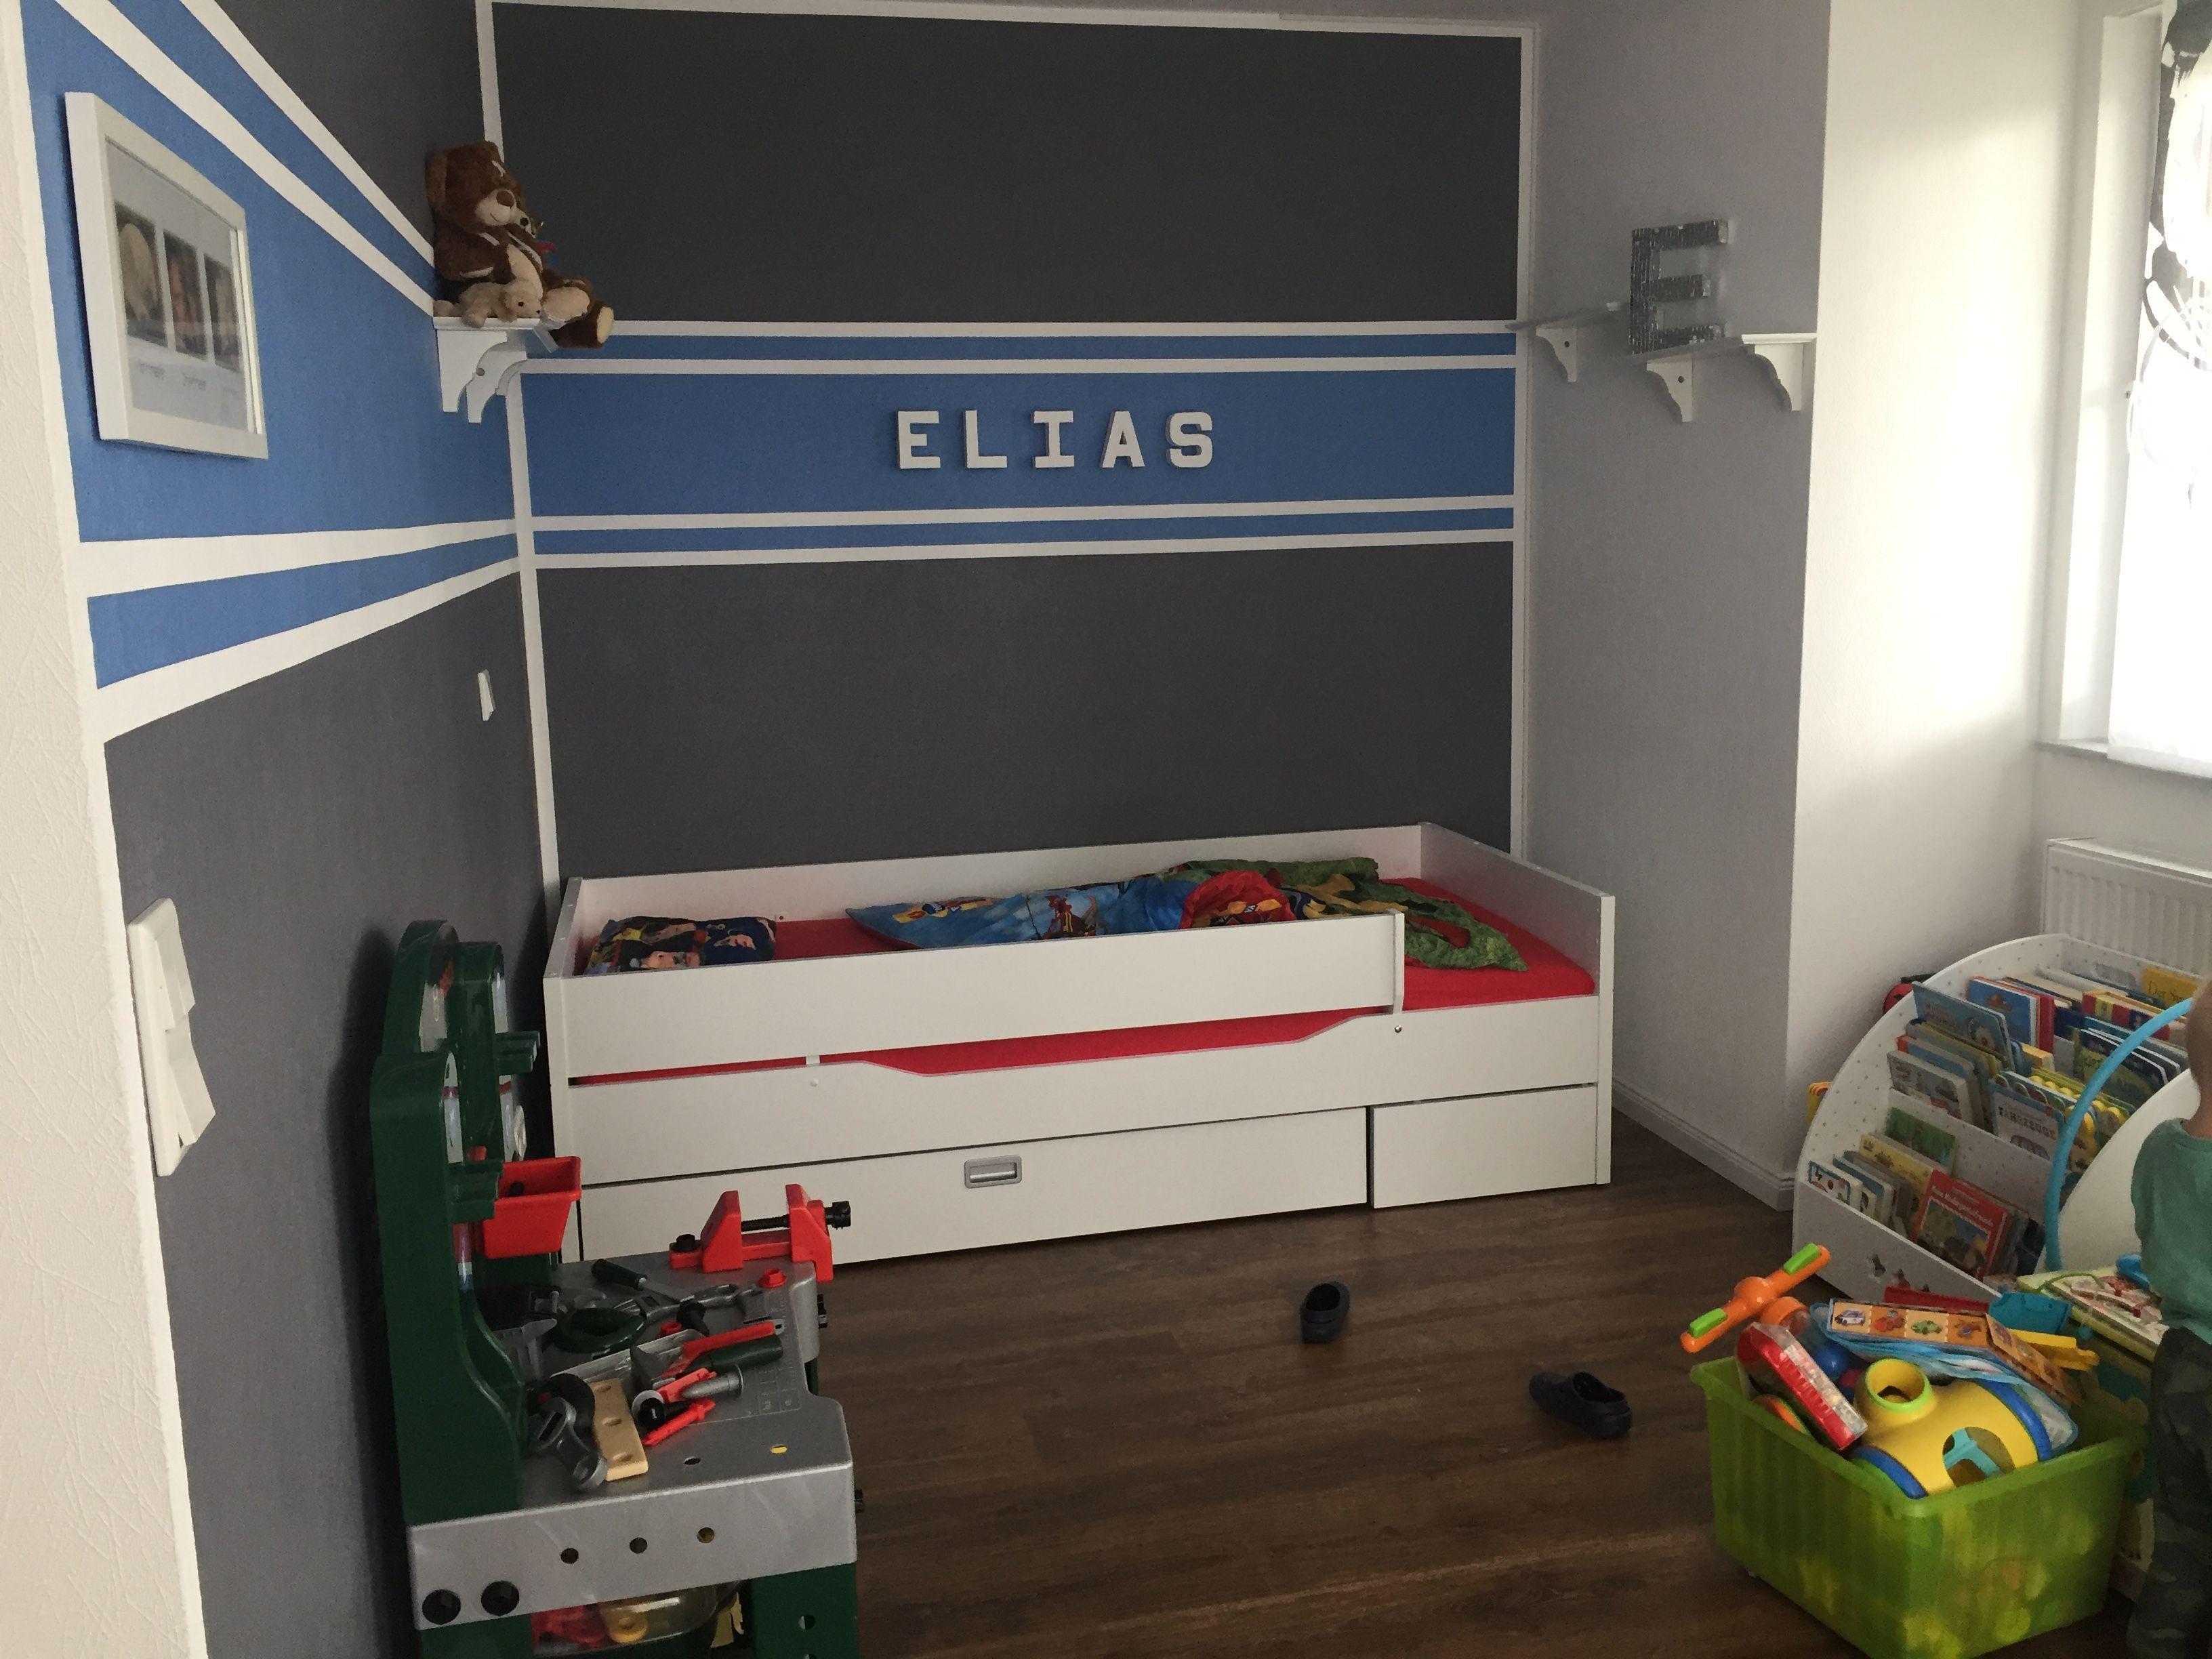 Wandfarbe Kinderzimmer Junge - Elias | Pinterest | {Wandfarbe kinderzimmer junge 23}